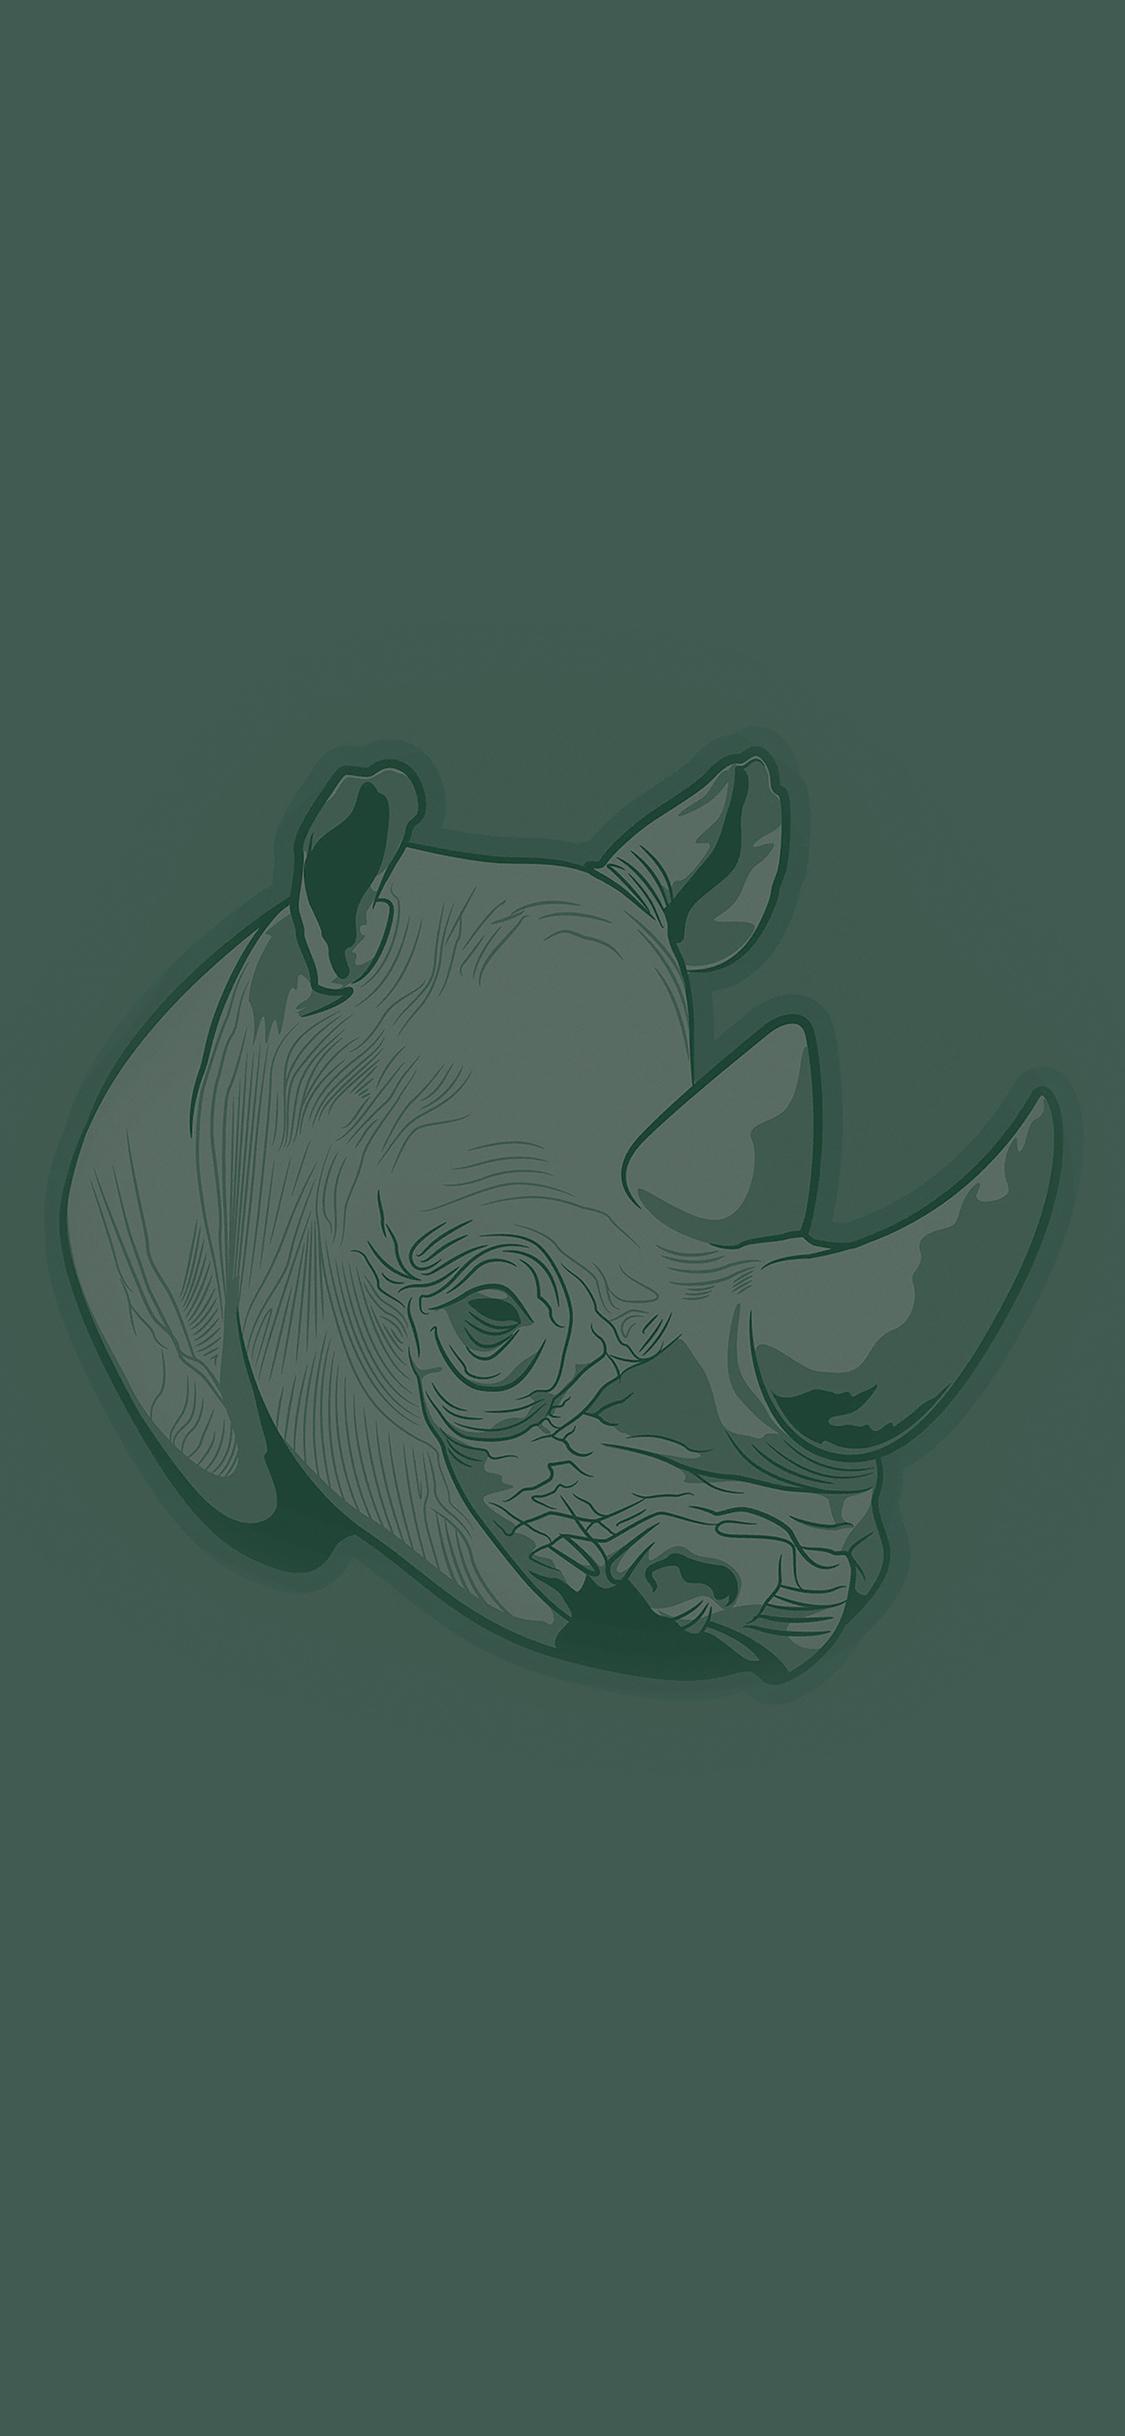 iPhoneXpapers.com-Apple-iPhone-wallpaper-aj53-thoughtful-rhino-green-minimal-illust-art